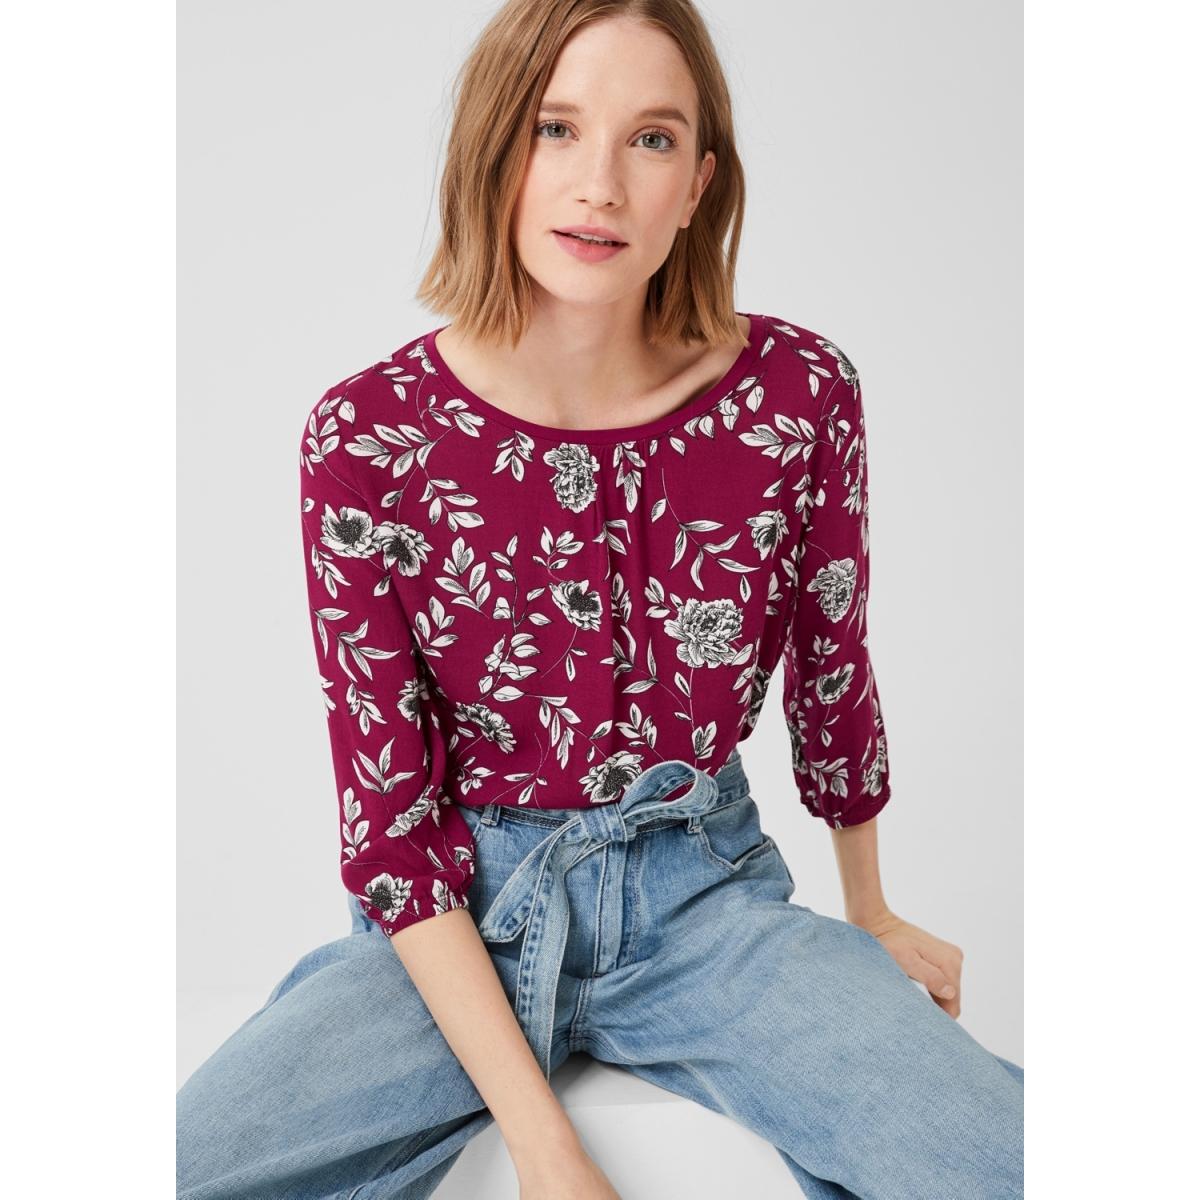 blouseachtig shirt 04899395385 s.oliver t-shirt 49b1